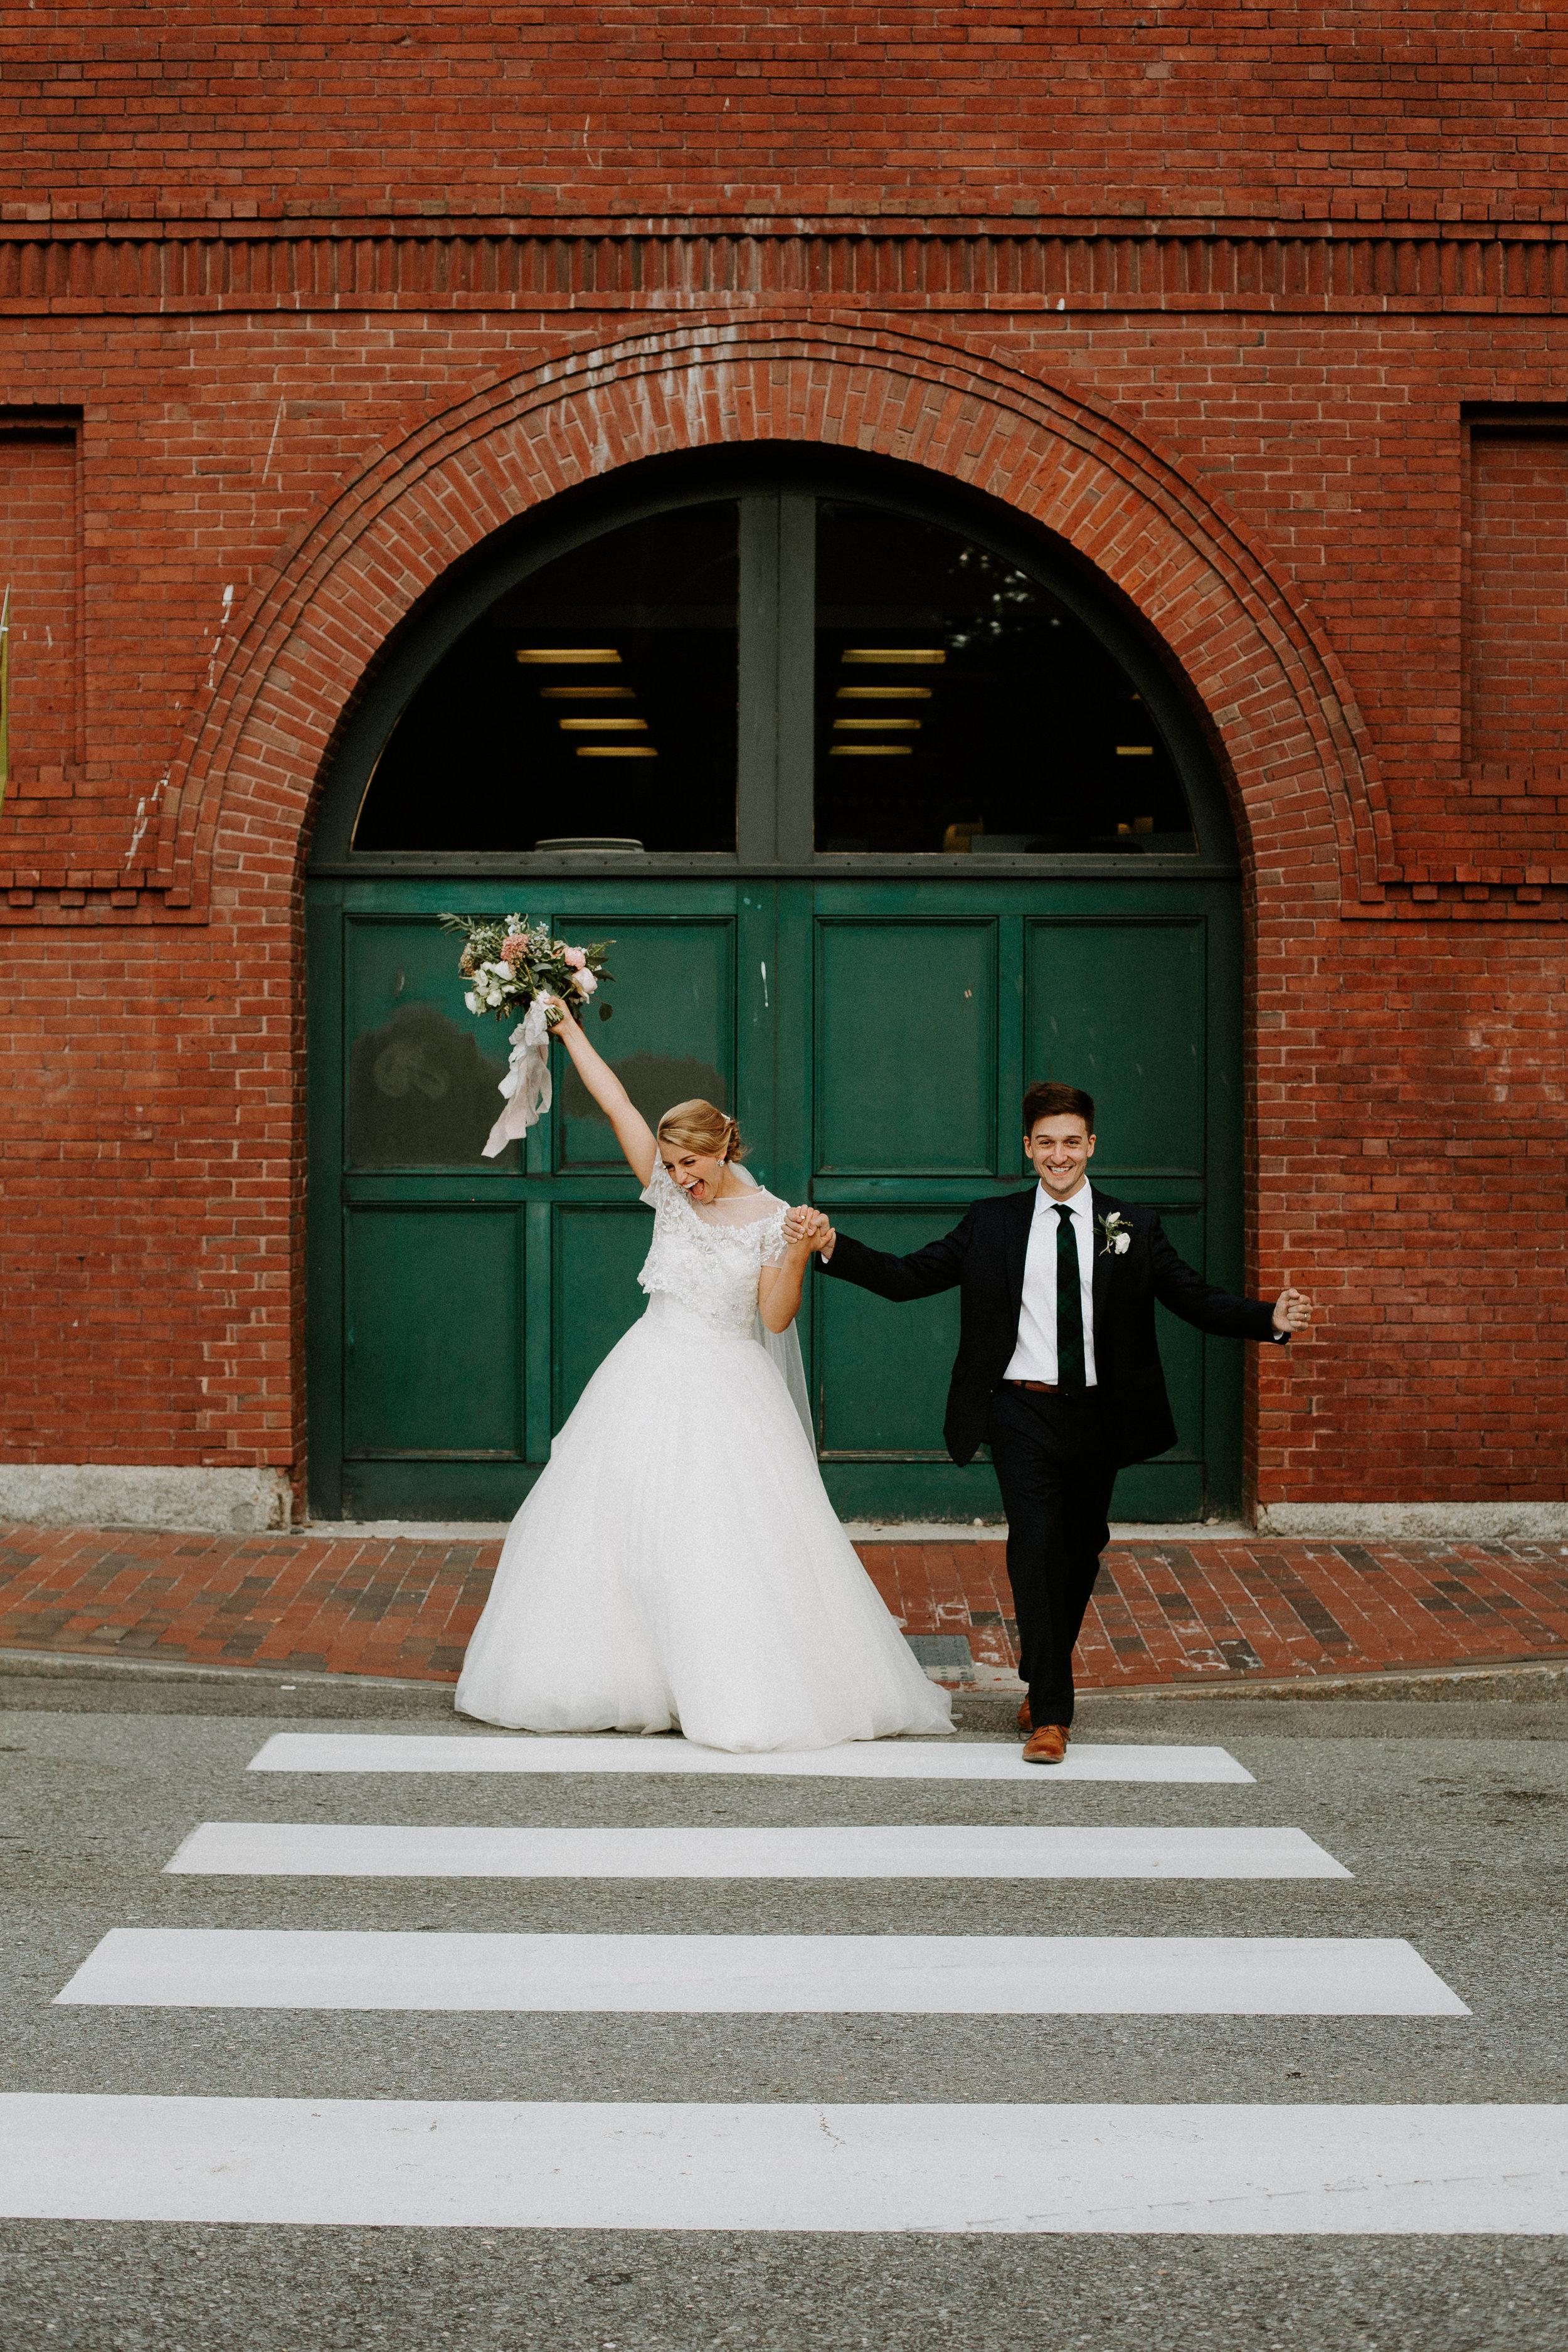 O_Maine-Studios-Portland-Maine-Wedding-EDIT-38.jpg